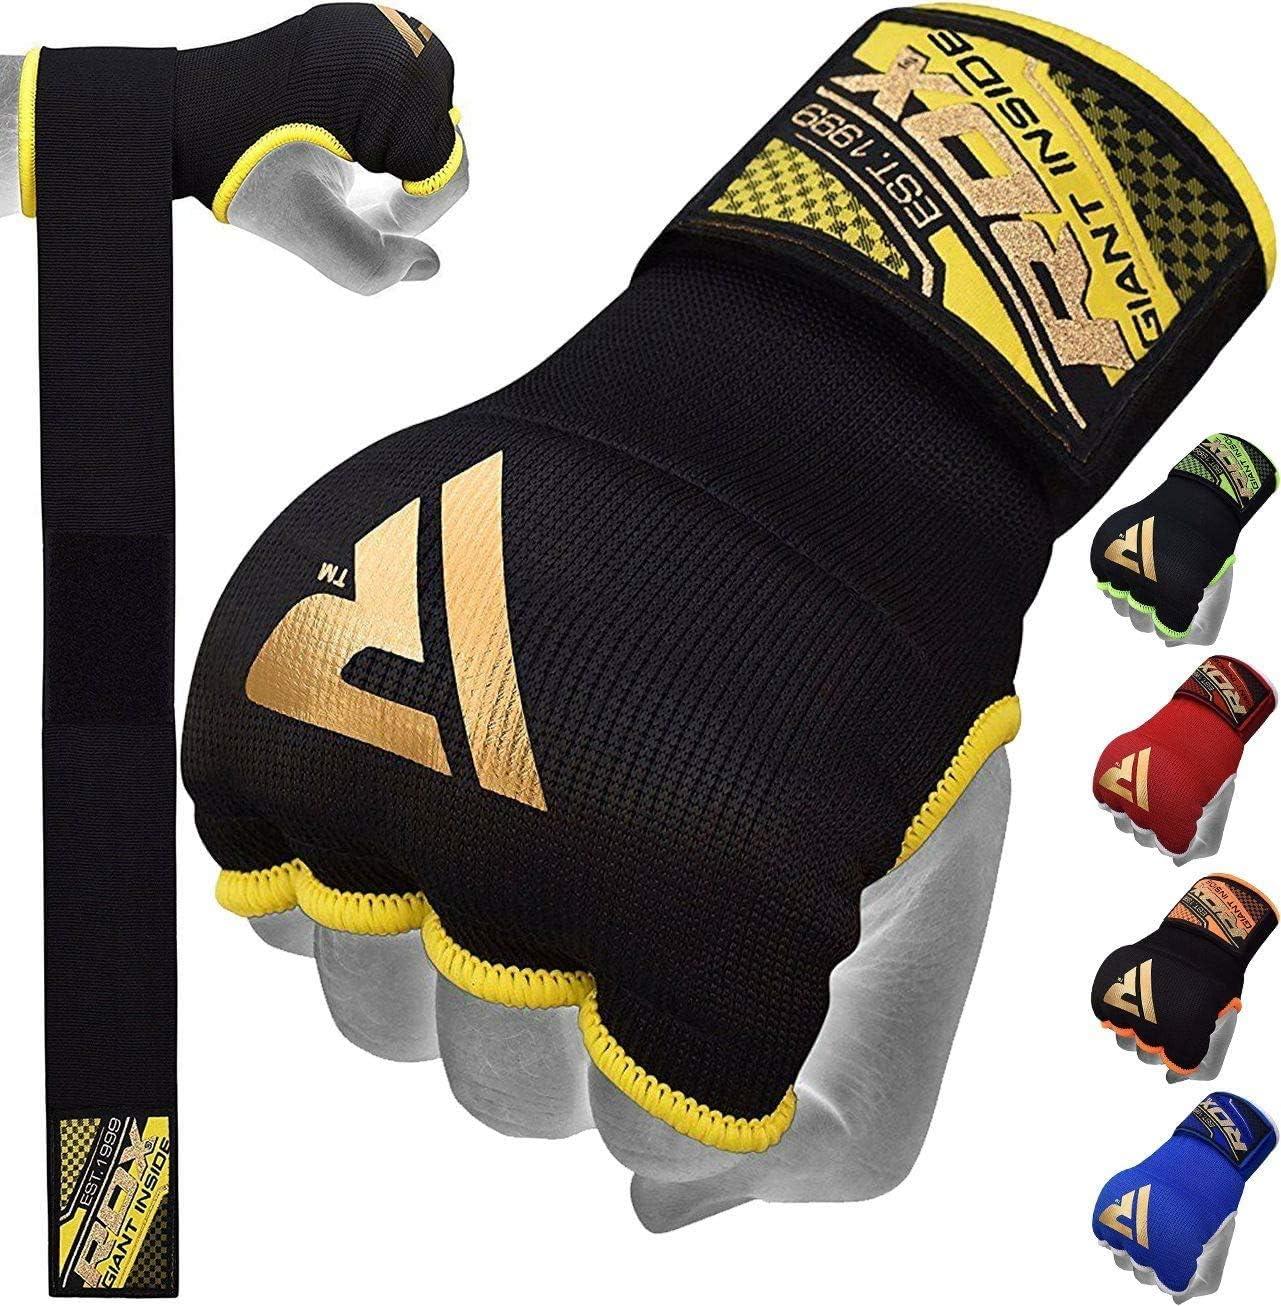 Professional Boxing Hand Wrap Gloves Wrist Protection Punching Fist Bandage